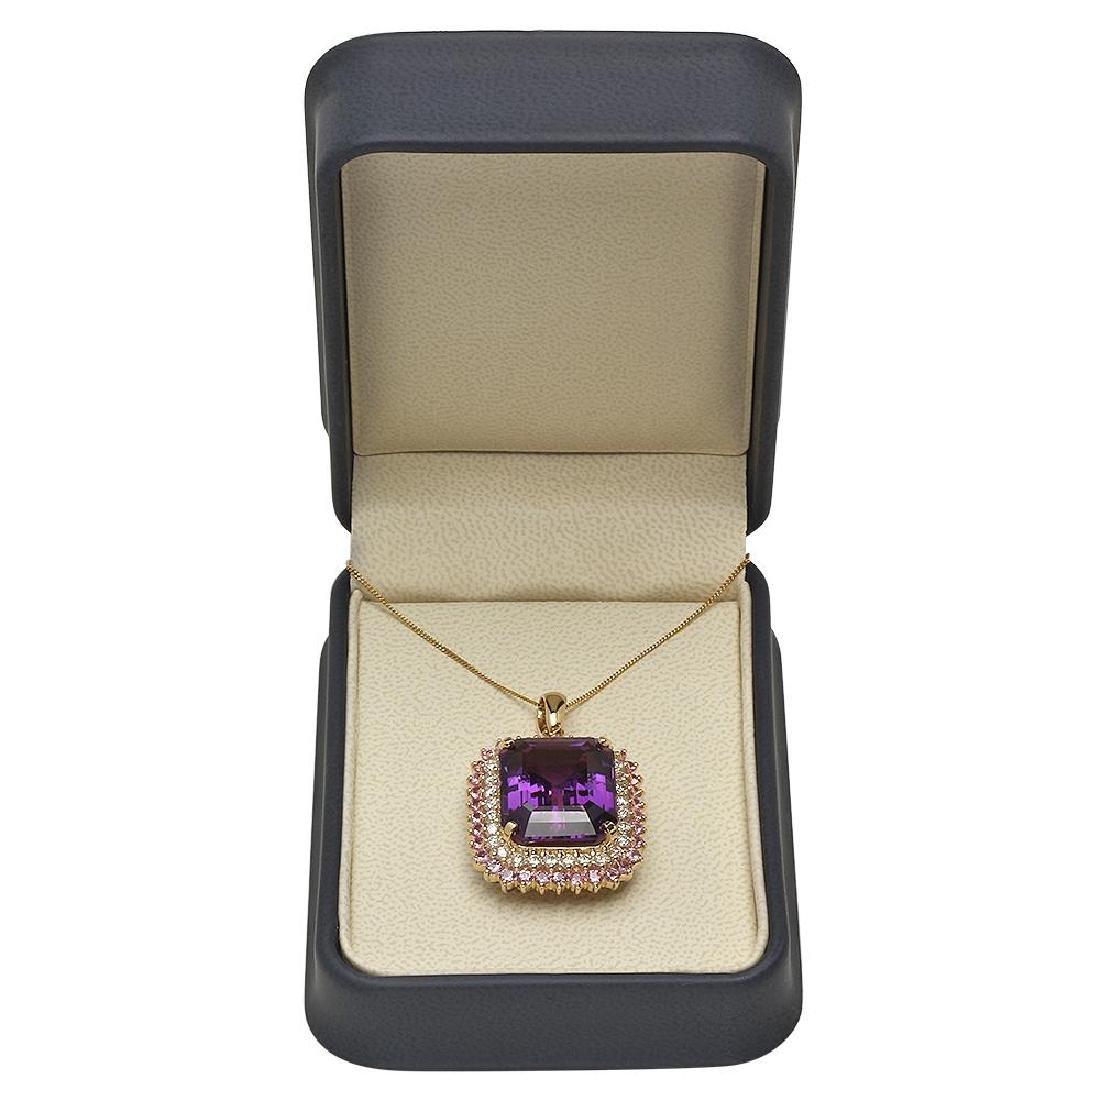 14K Gold 25.44ct Amethyst 2.03ct Sapphire 1.51ct - 4